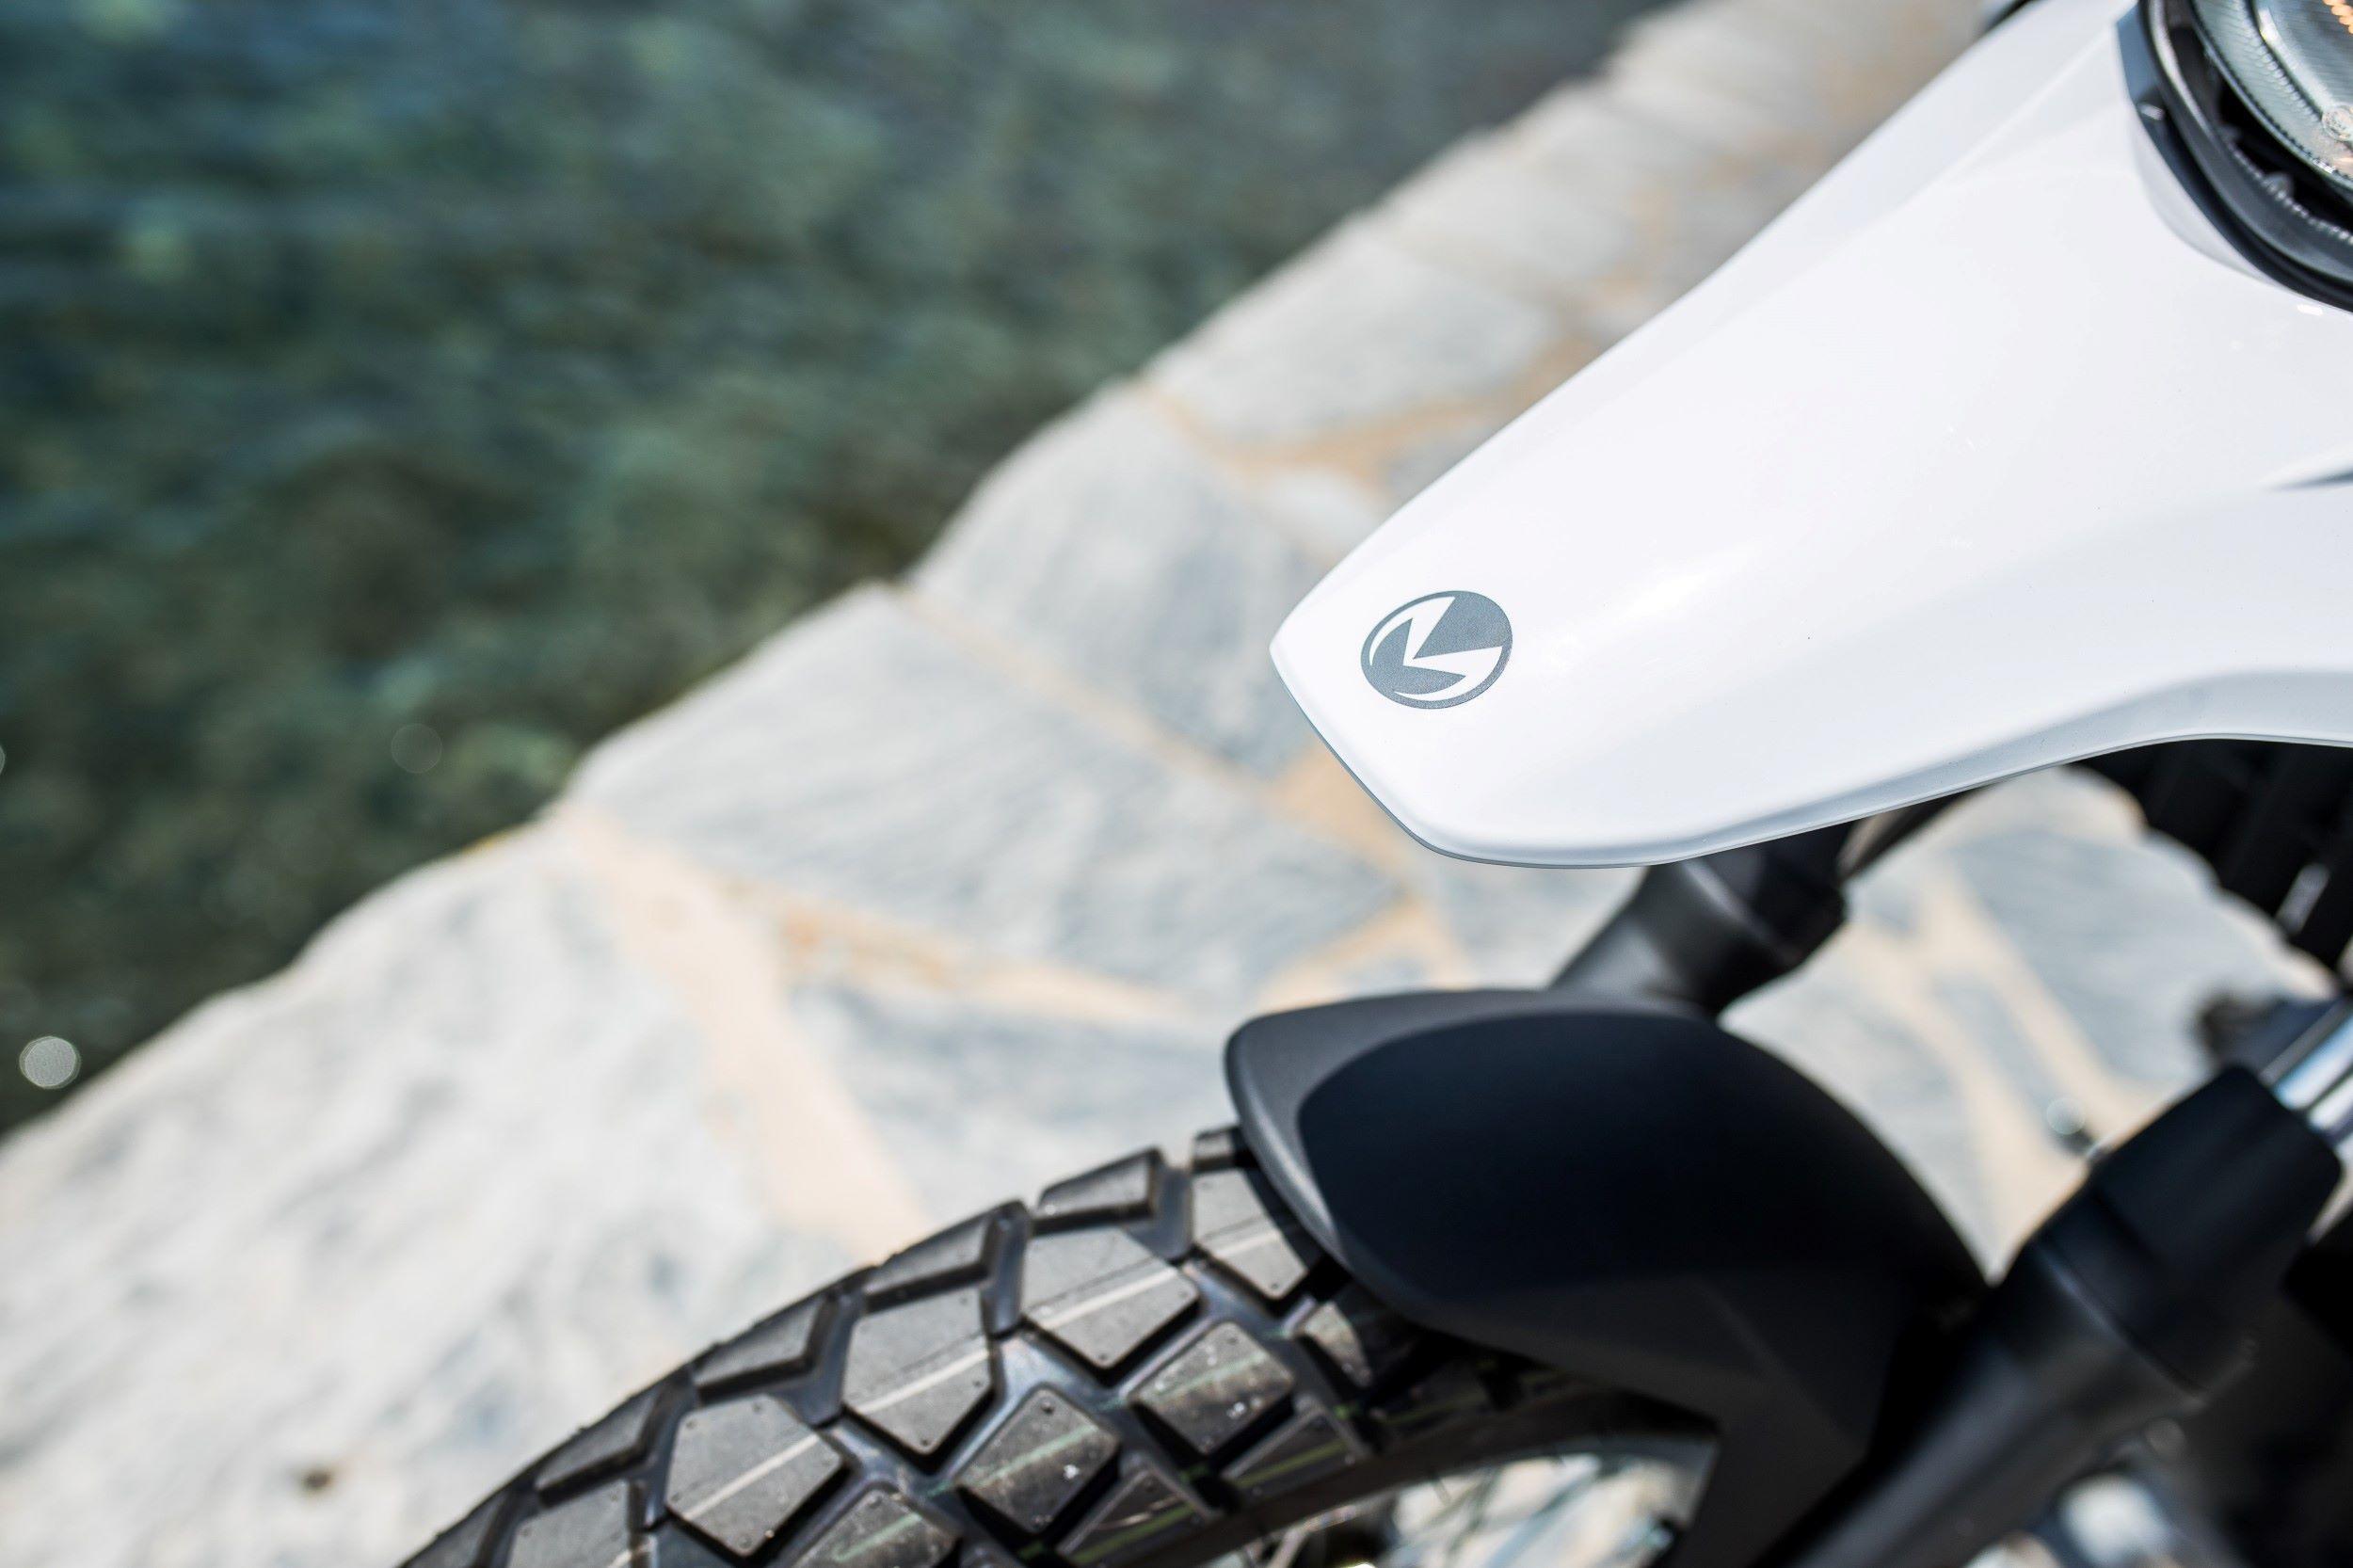 https://malaguti.bike/wp-content/uploads/sites/3/2021/08/dune-vorderrad-mirrored-80.jpg